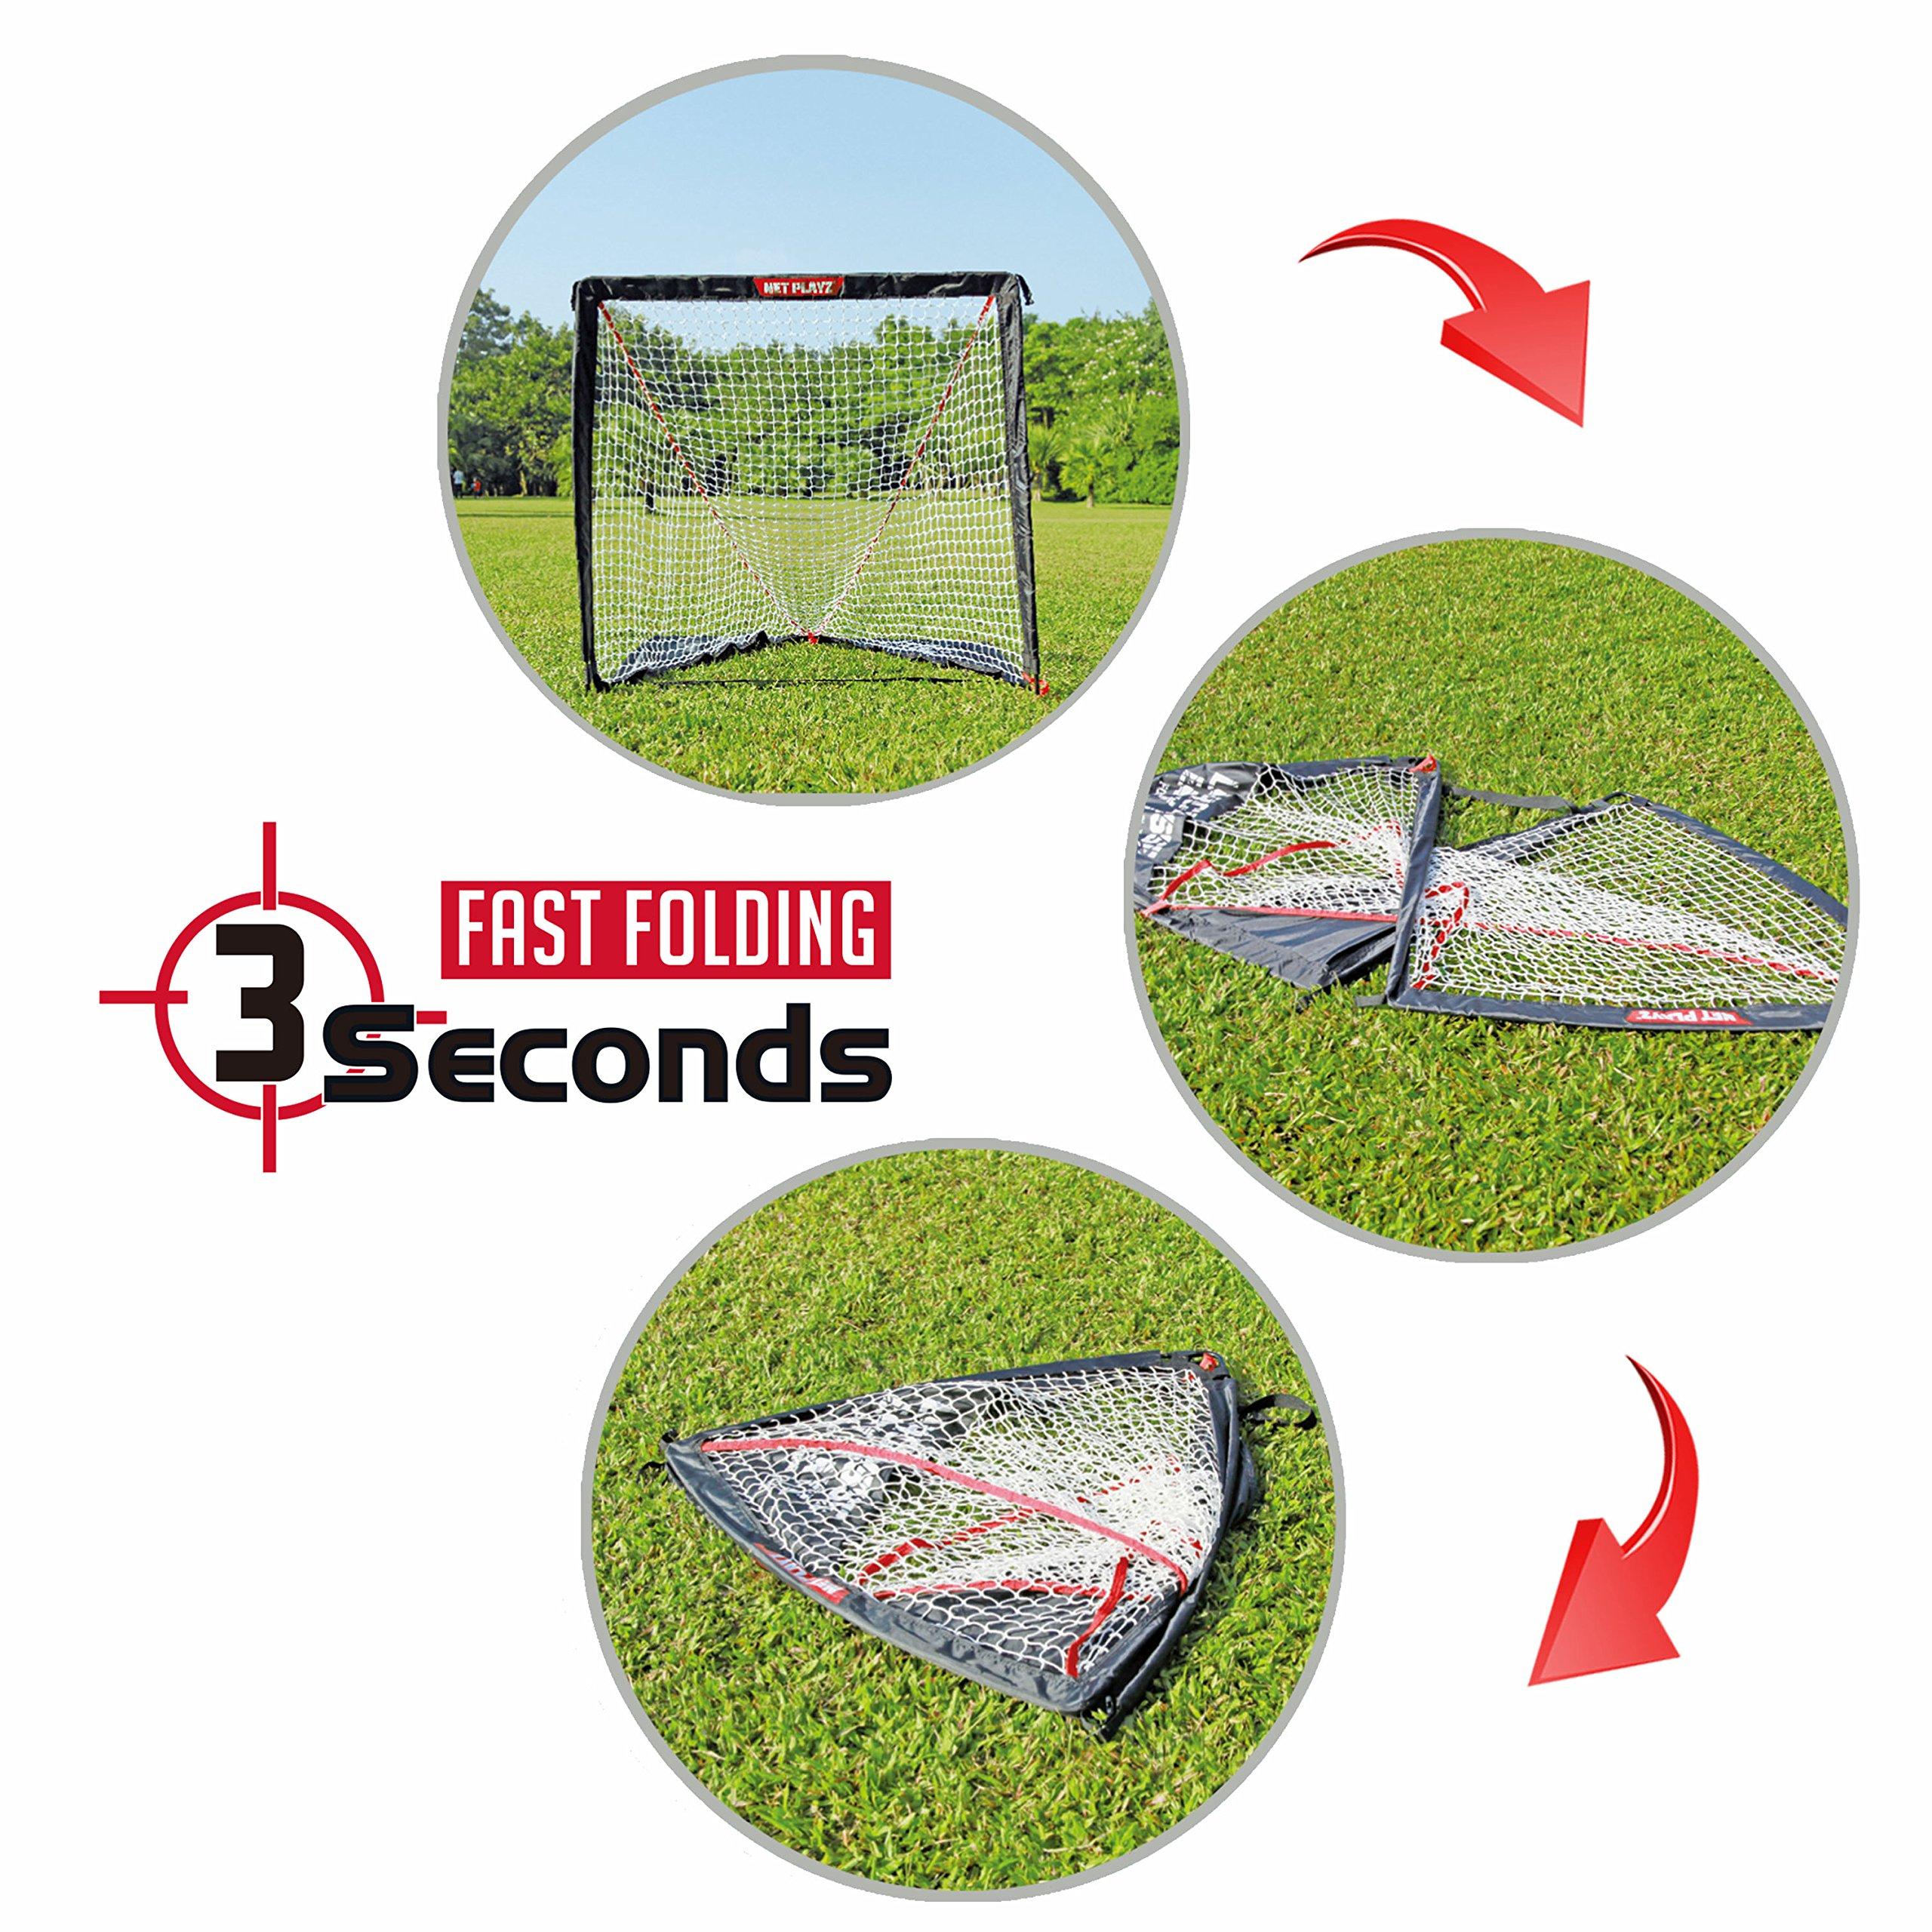 NET PLAYZ 4 x 4 x 4 Feet Lacrosse Goal Fast Install, Fiberglass Frme, Lightweight, Foldable, Portable, Carry bag Included by NET PLAYZ (Image #3)